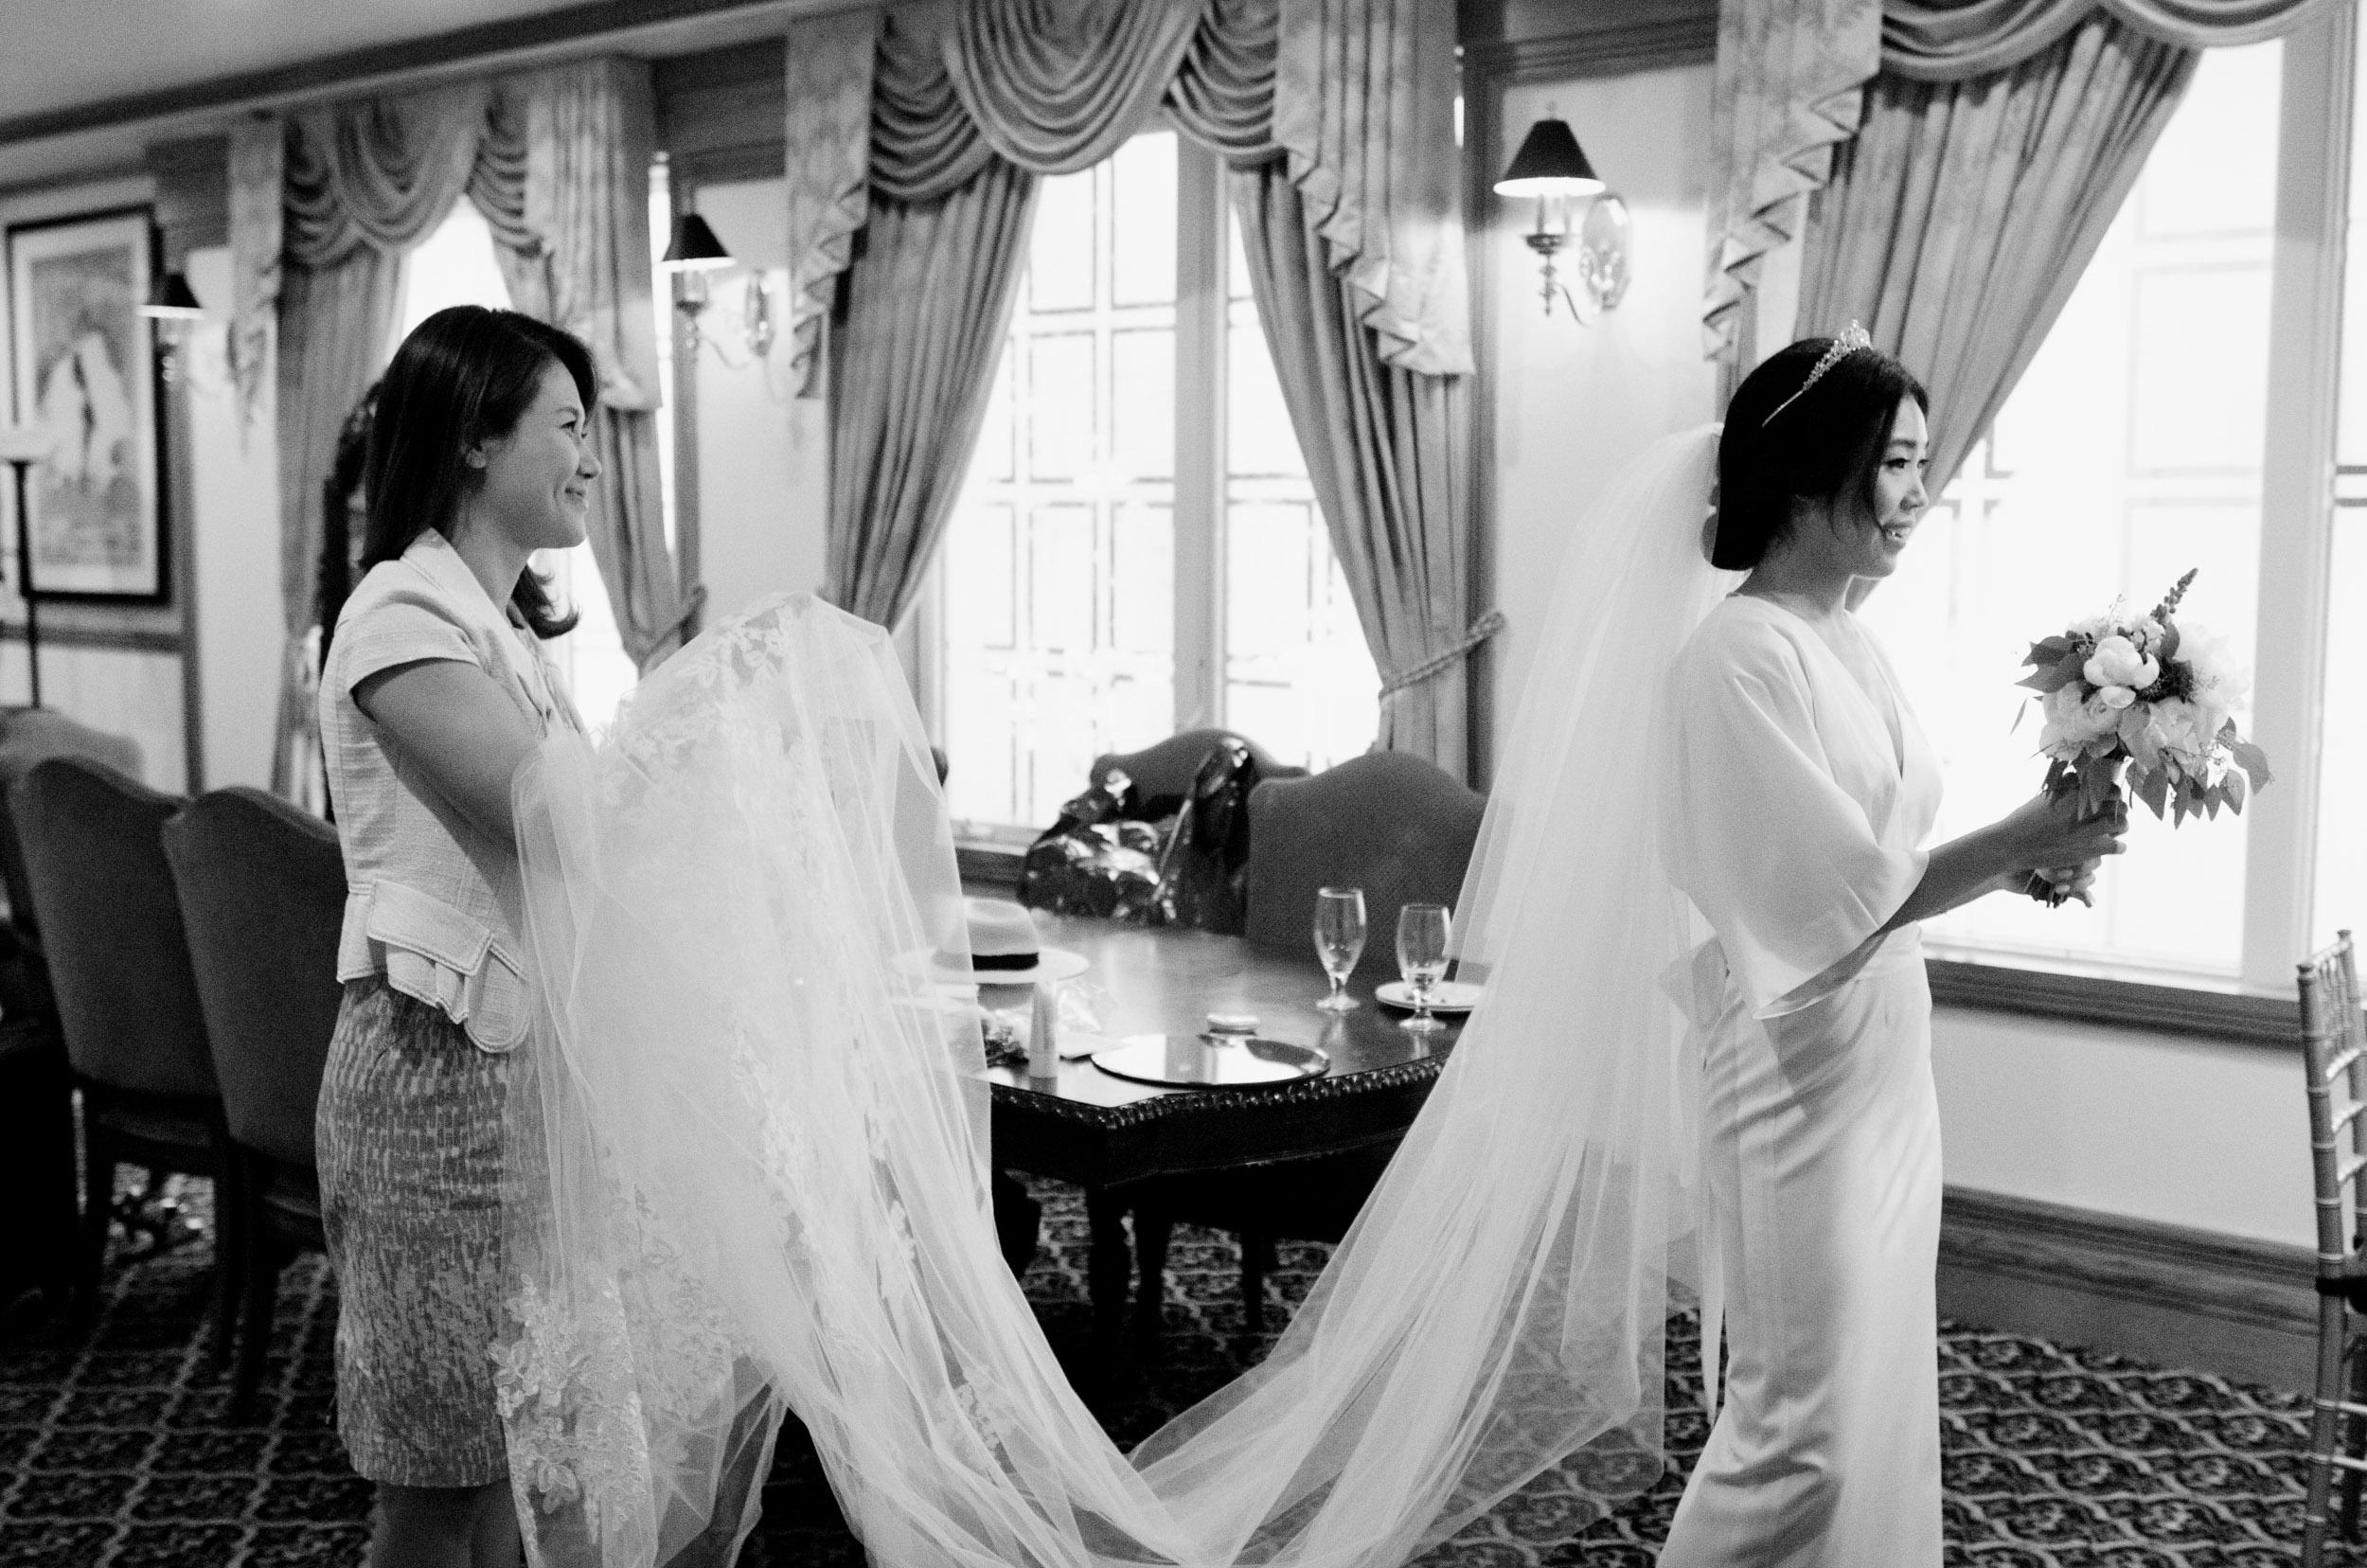 jean-arnold-wedding-0021.jpg